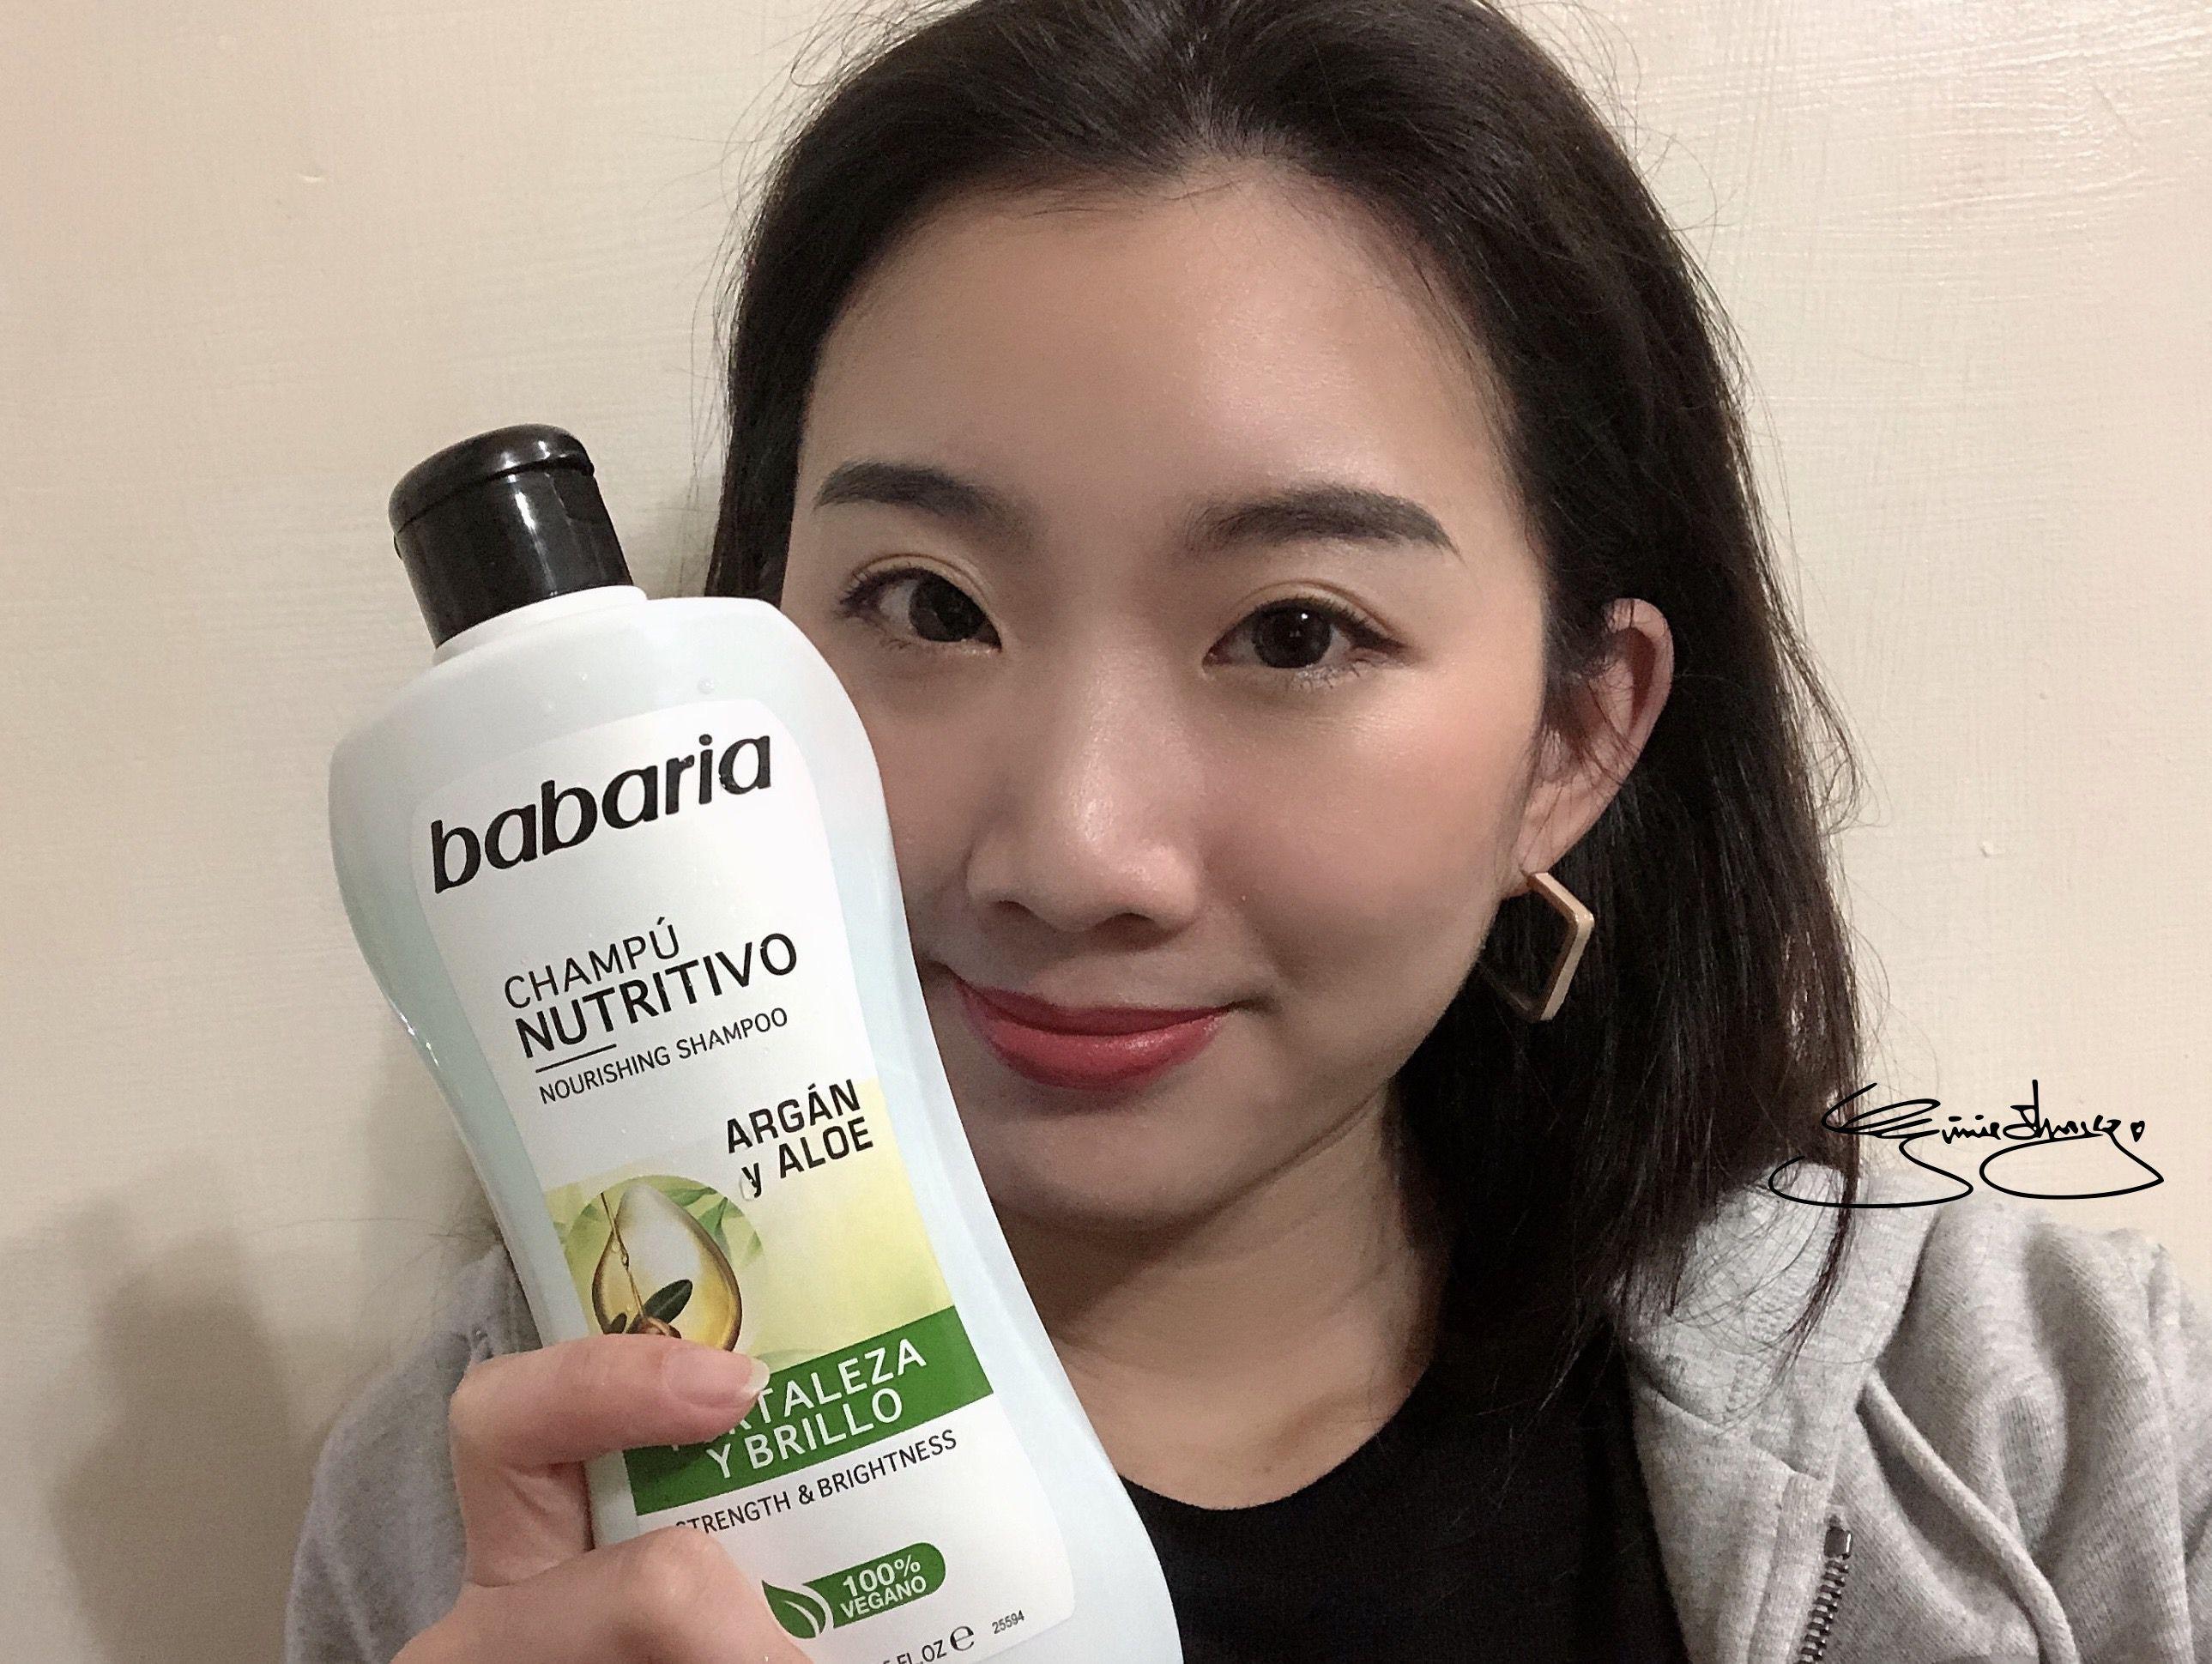 babaria摩洛哥油蘆薈修護洗髮露